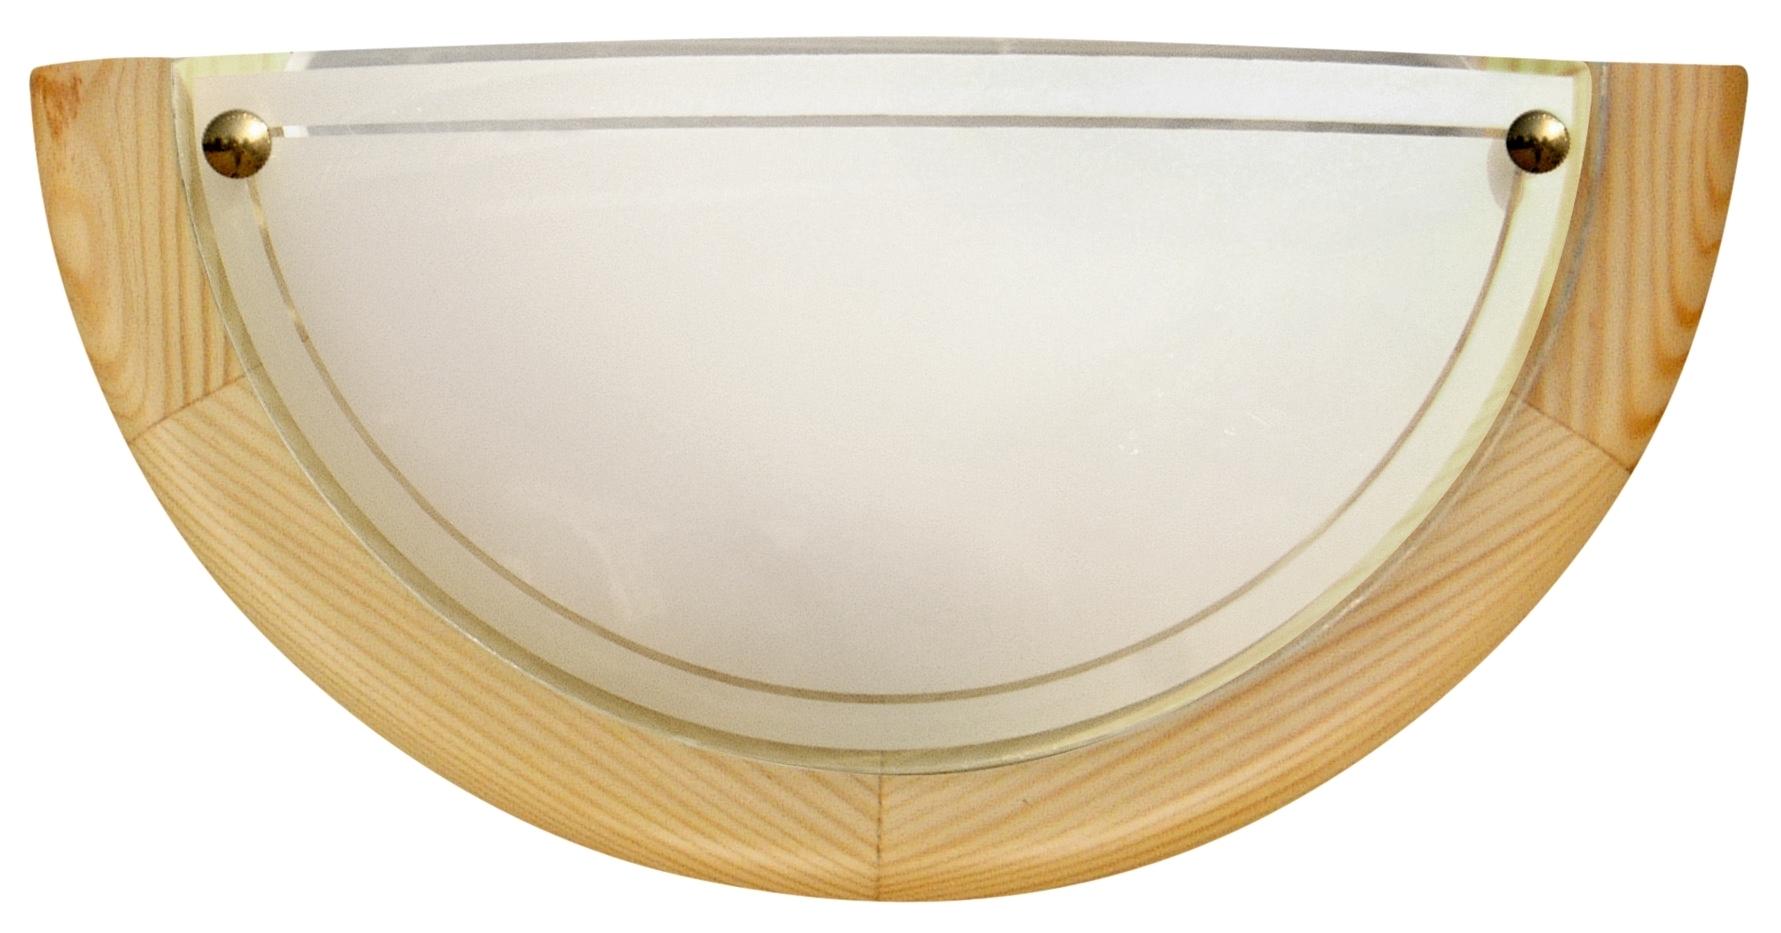 1030 LAMPA SUFITOWA PLAFON1/2 DREWNO STANDARD 1X60W E27 SOSNA - 11-32440